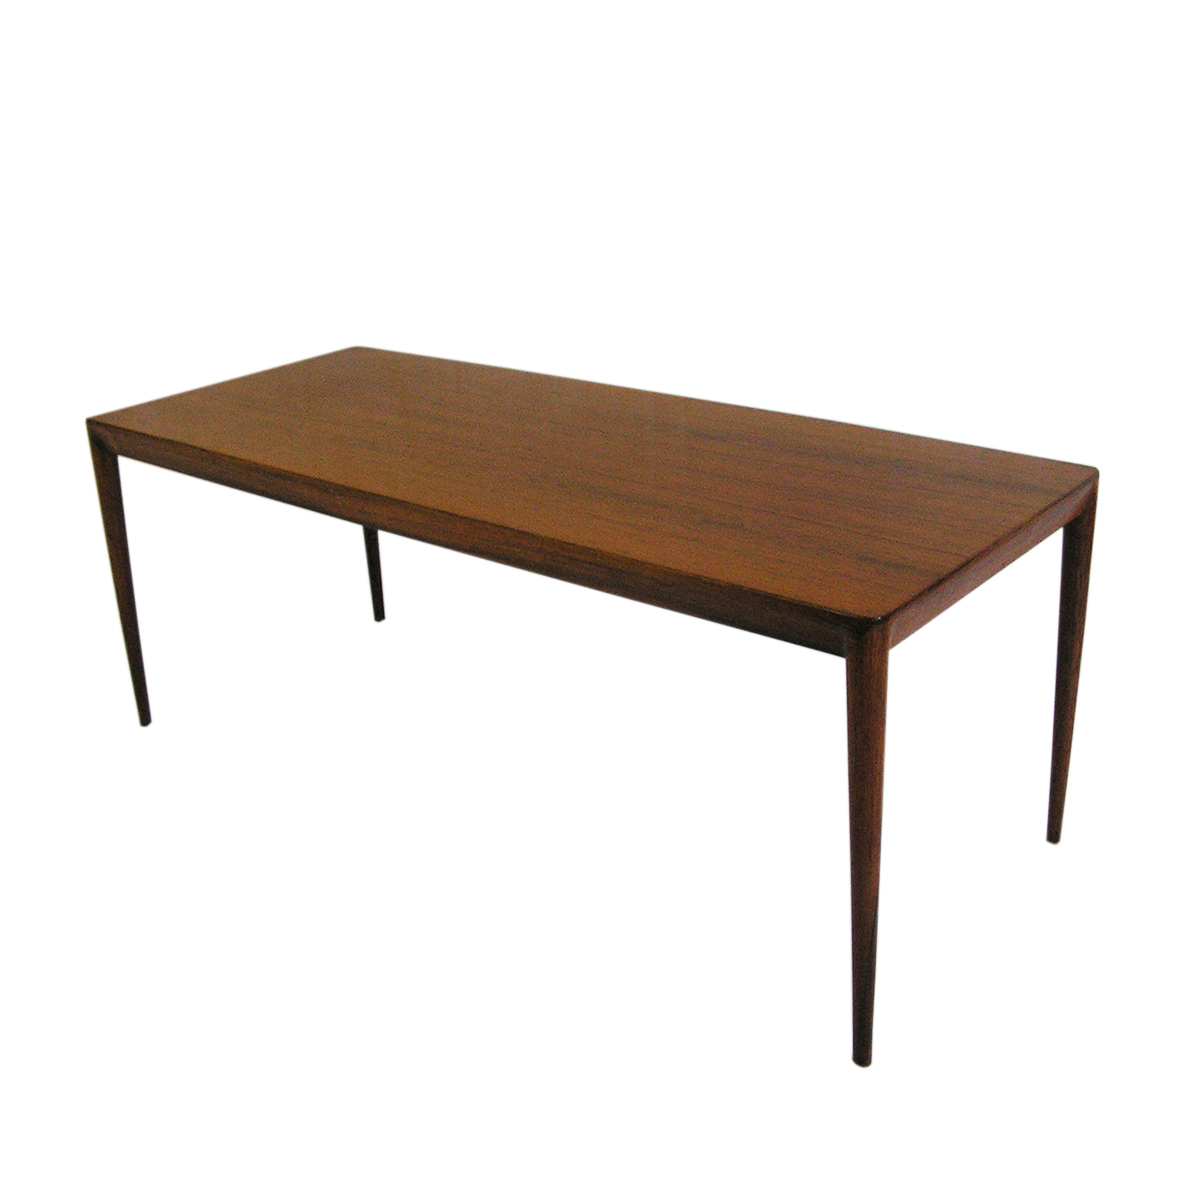 erik-riisager-hansen-haslev-coffee-table-rosewood-vintage